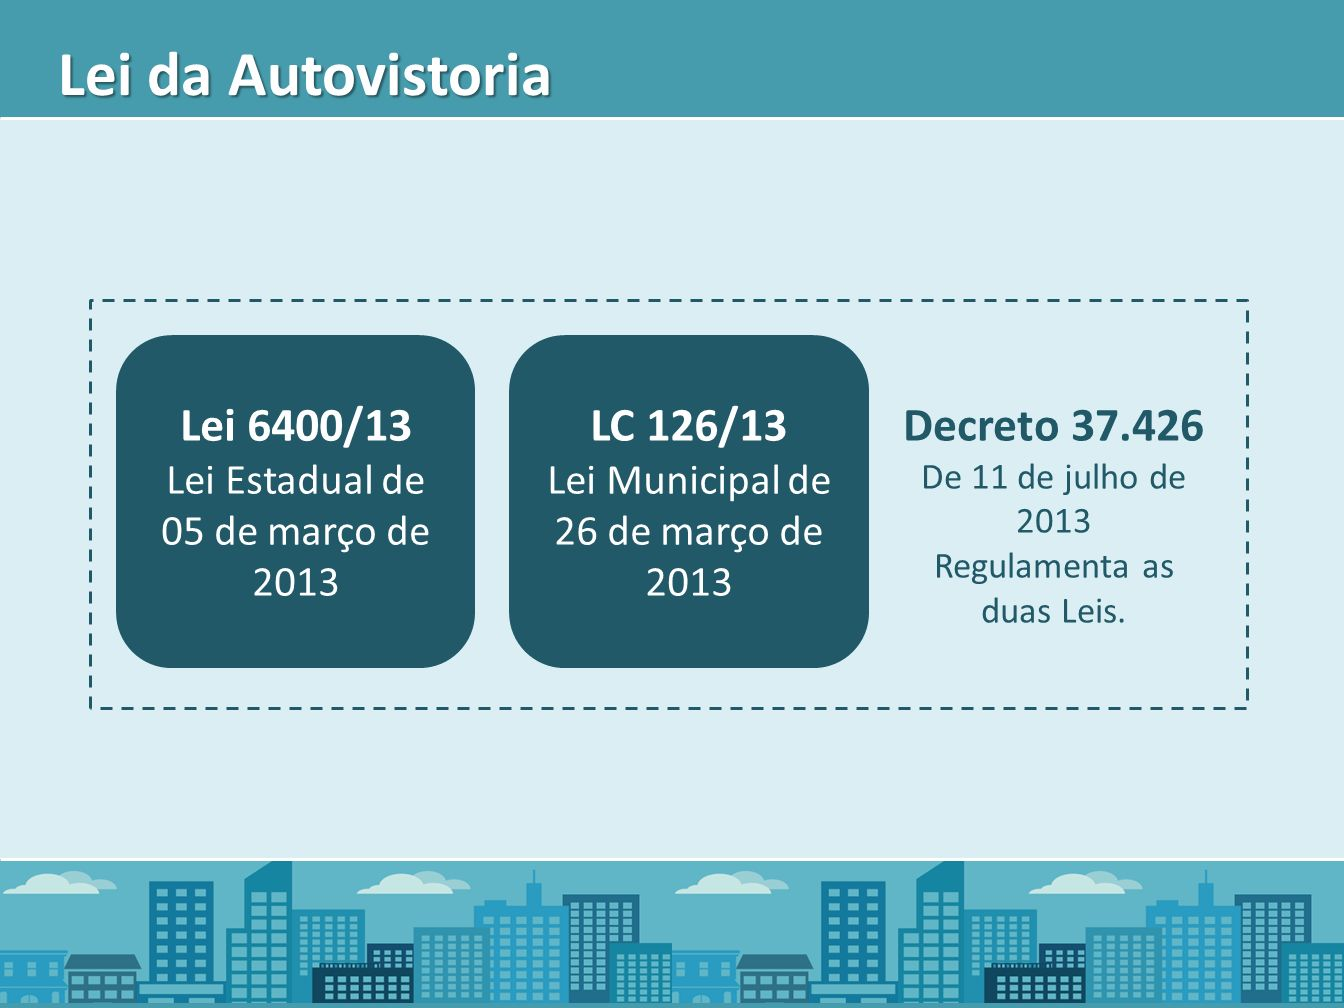 Decreto 37.426 De 11 de julho de 2013 Regulamenta as duas Leis. LC 126/13 Lei Municipal de 26 de março de 2013 Lei 6400/13 Lei Estadual de 05 de março